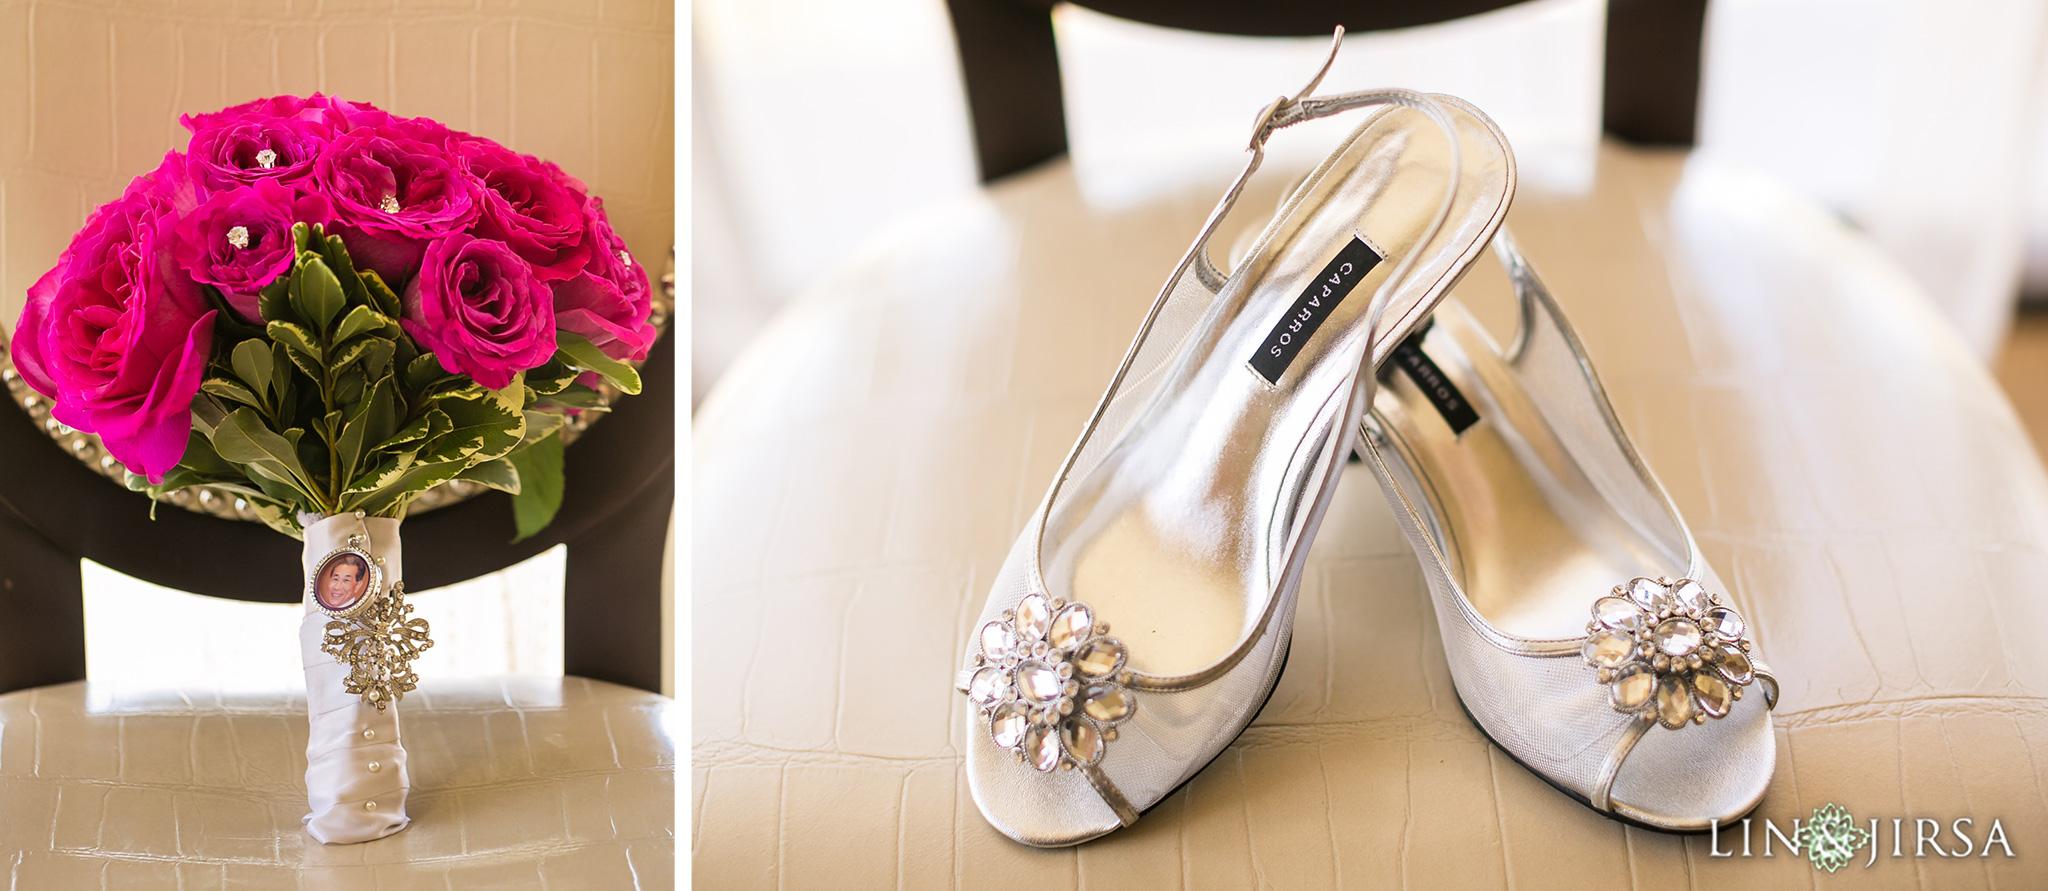 08-universal-city-sheraton-wedding-photography